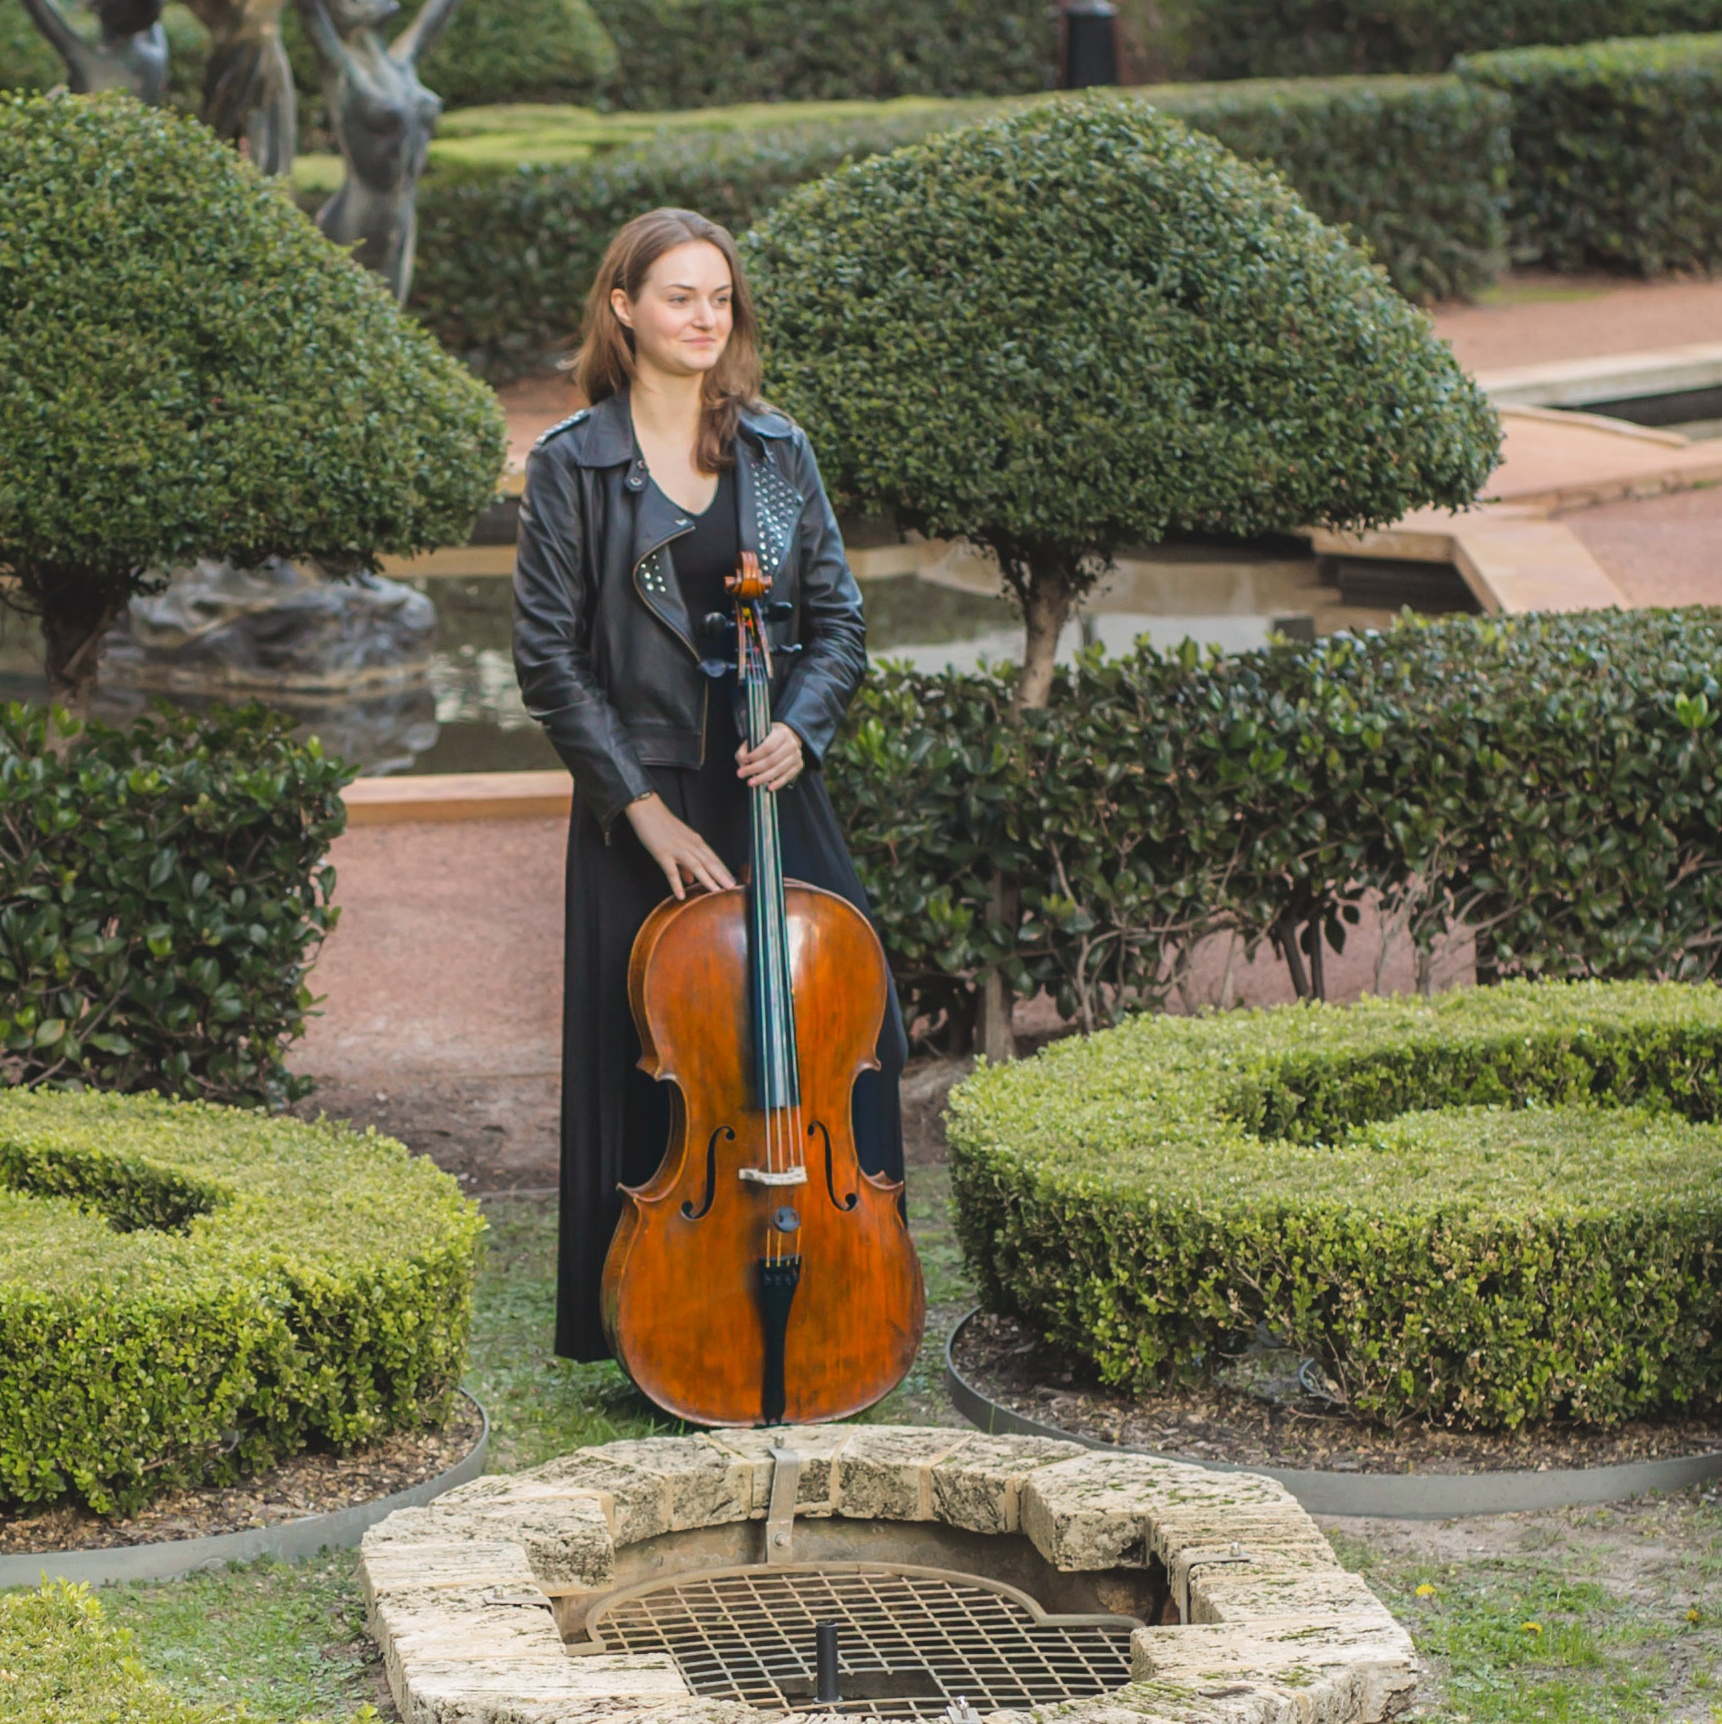 perth-function-string-music-hire-wedding-riverside-cellist-cello